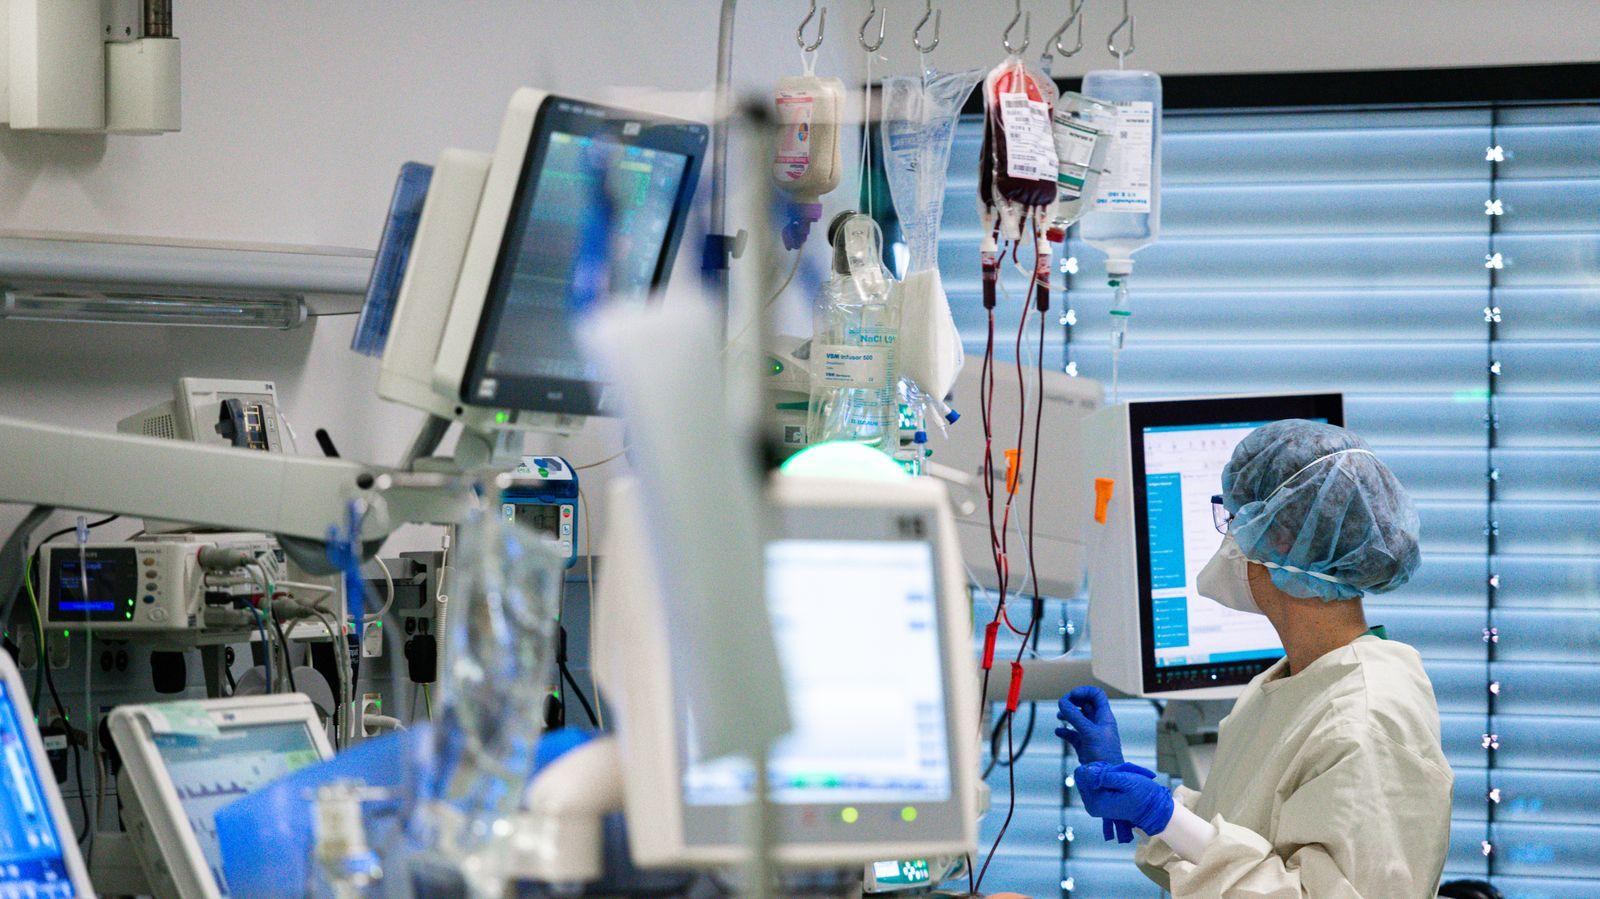 Aachen Hospital Treats Covid-19 Patients